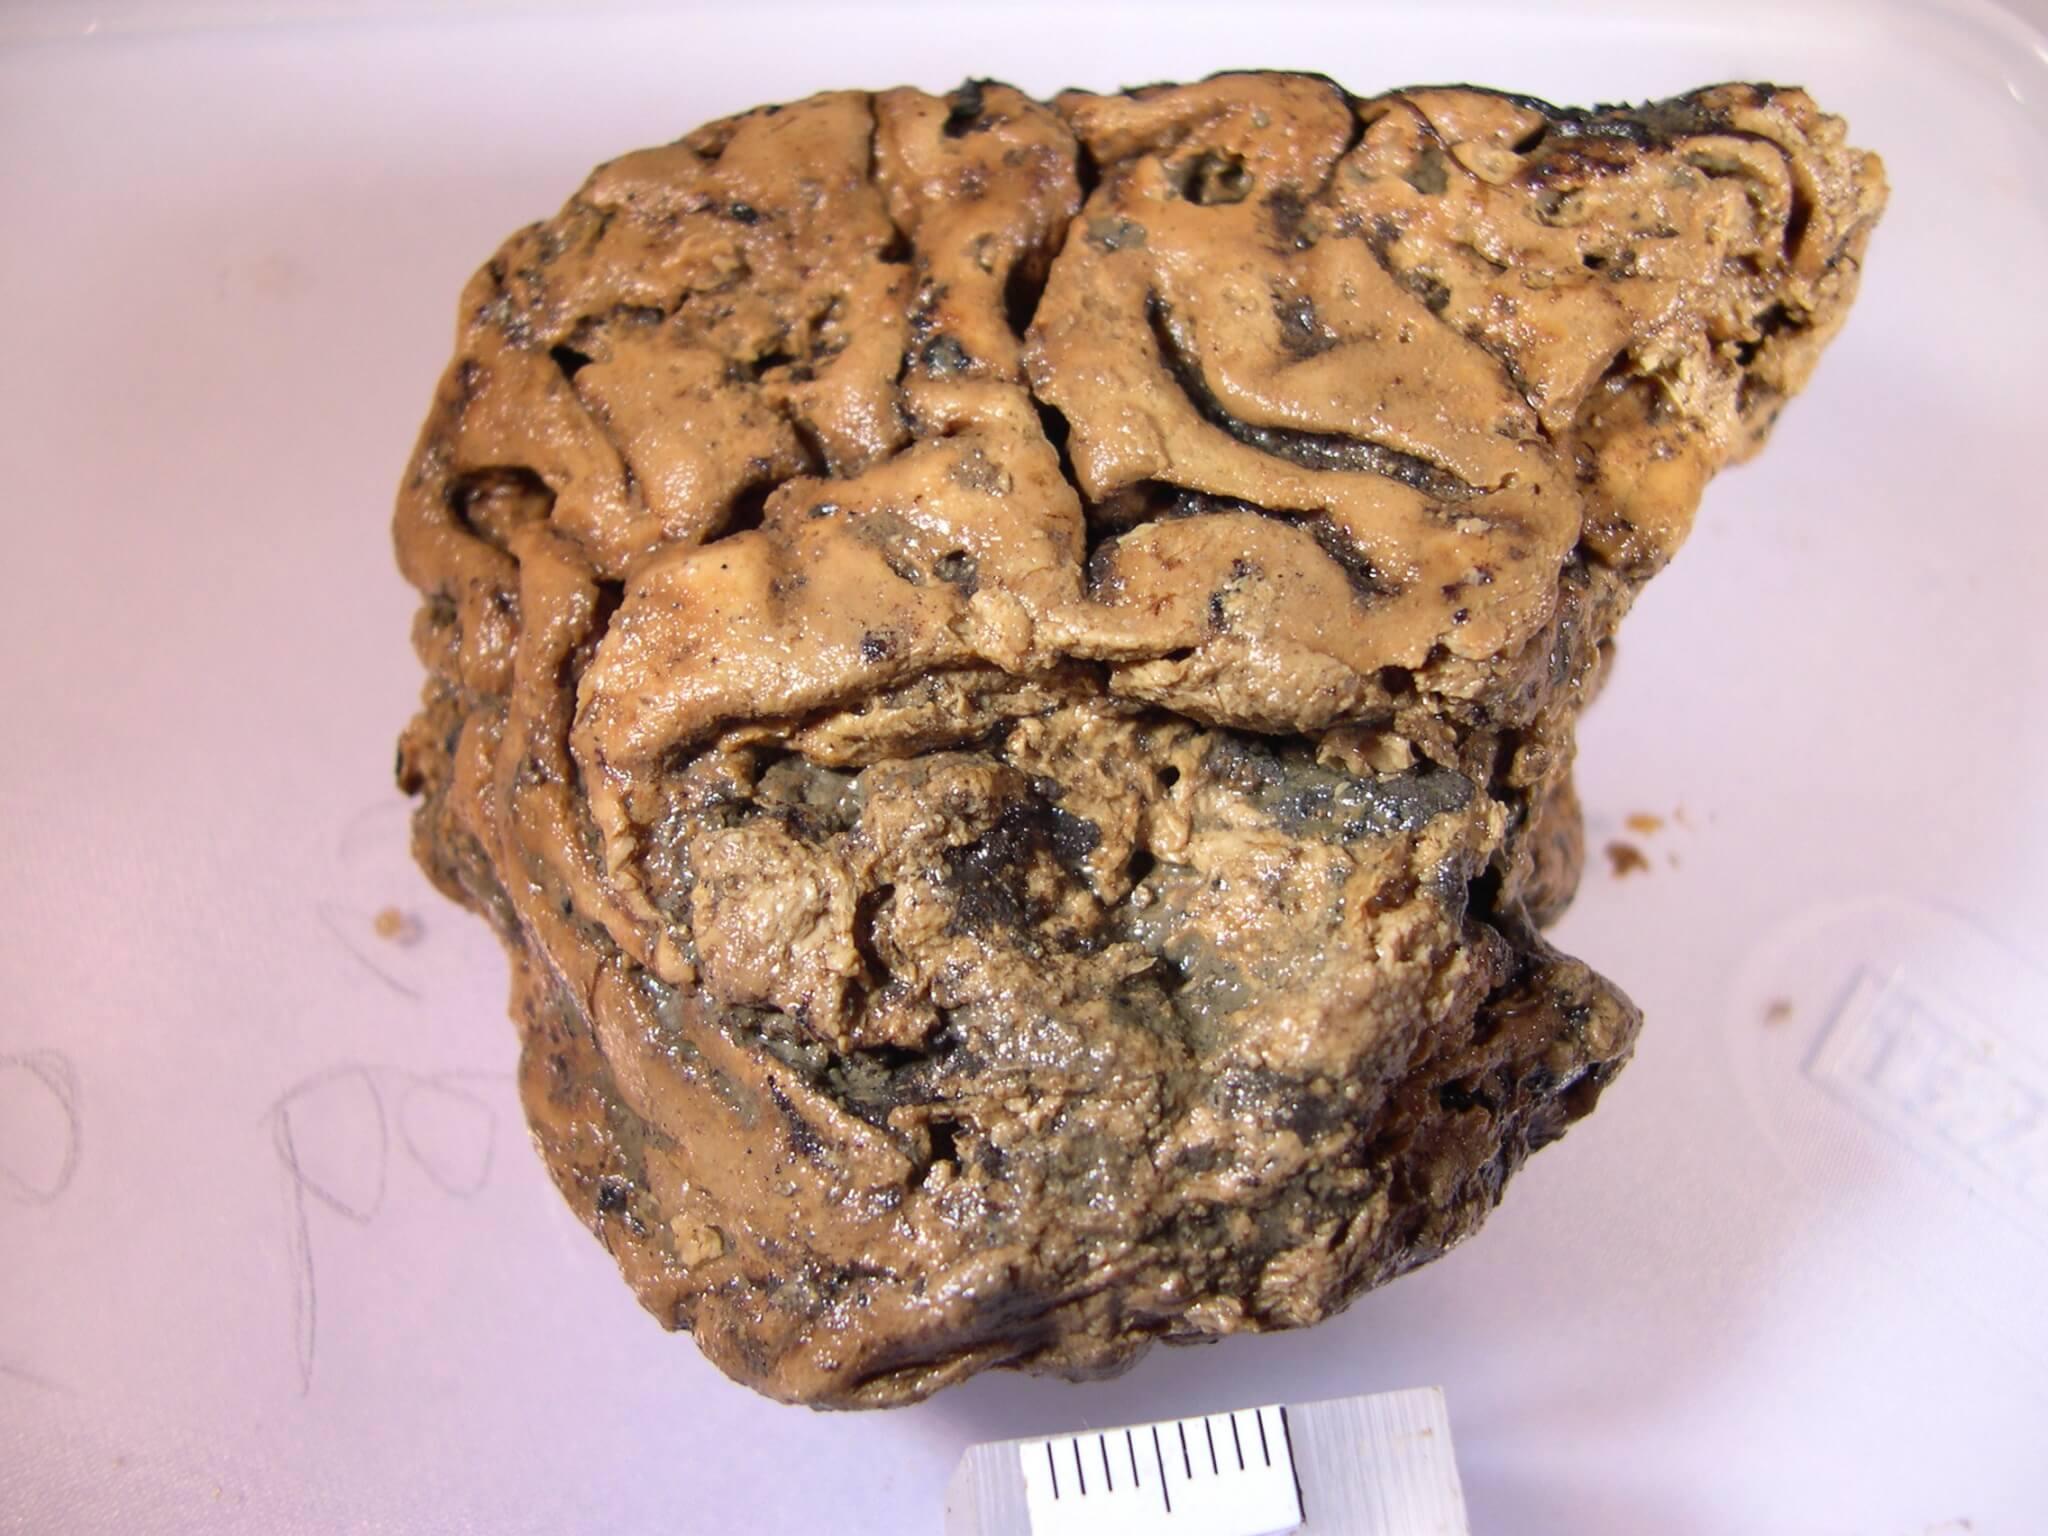 древний человек, мозг